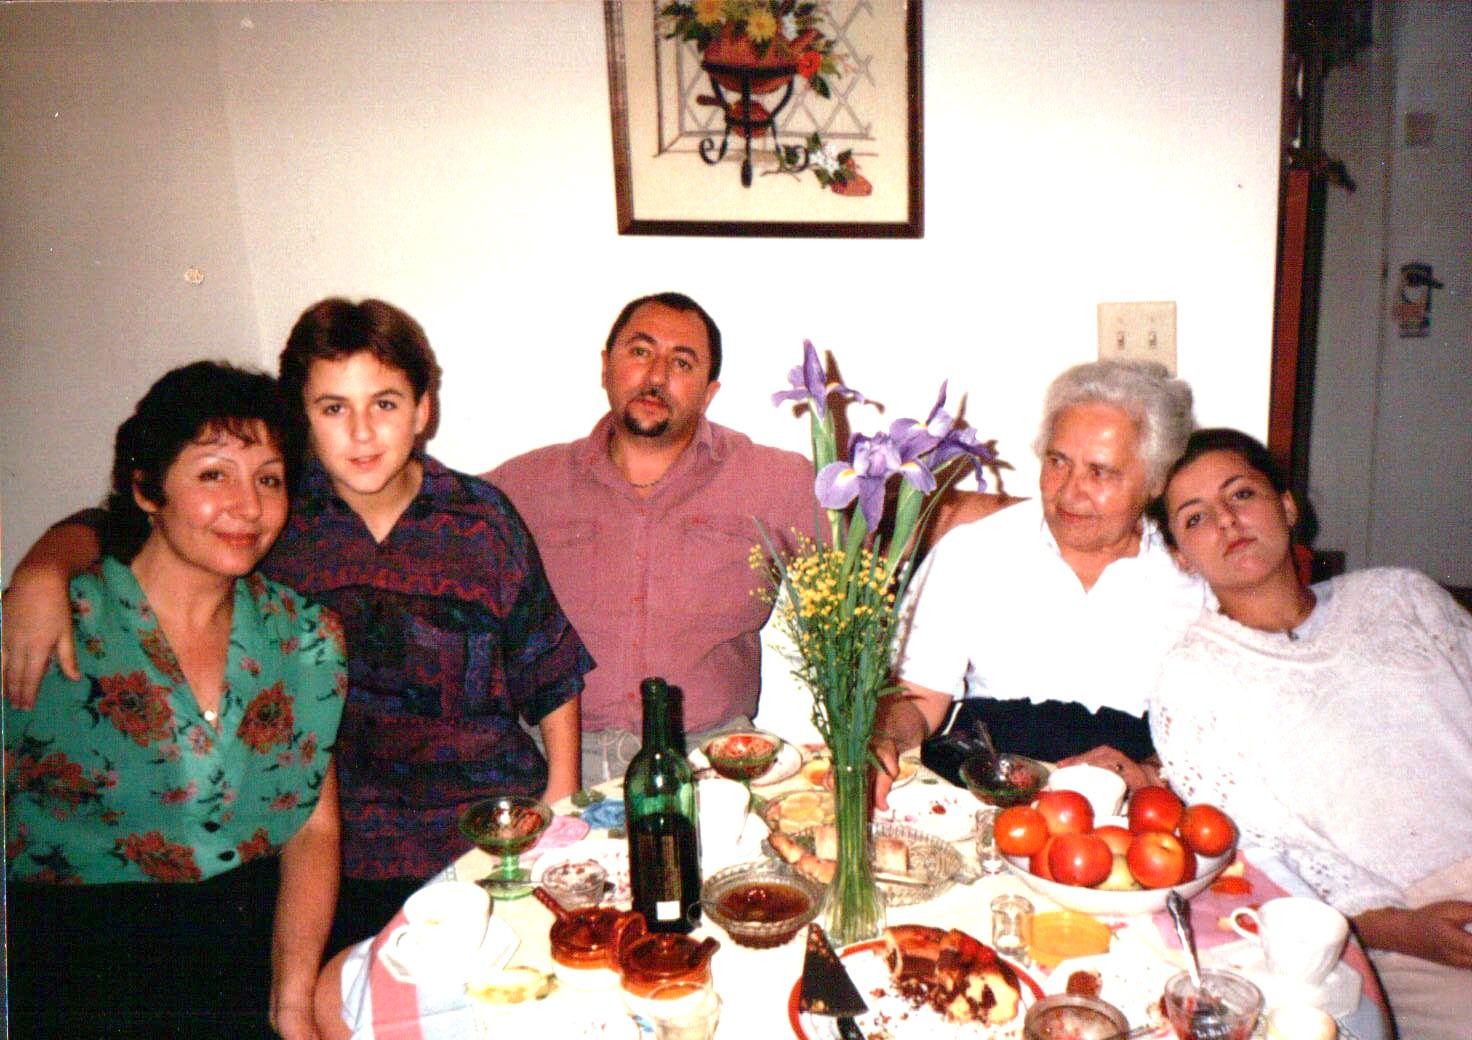 Shortly after immigrating to Orlando – Irina Khazina (mother), Kostya, Boris Kimlat (father), Inna Shatsman (grandmother), and Jenya Kimlat (sister)